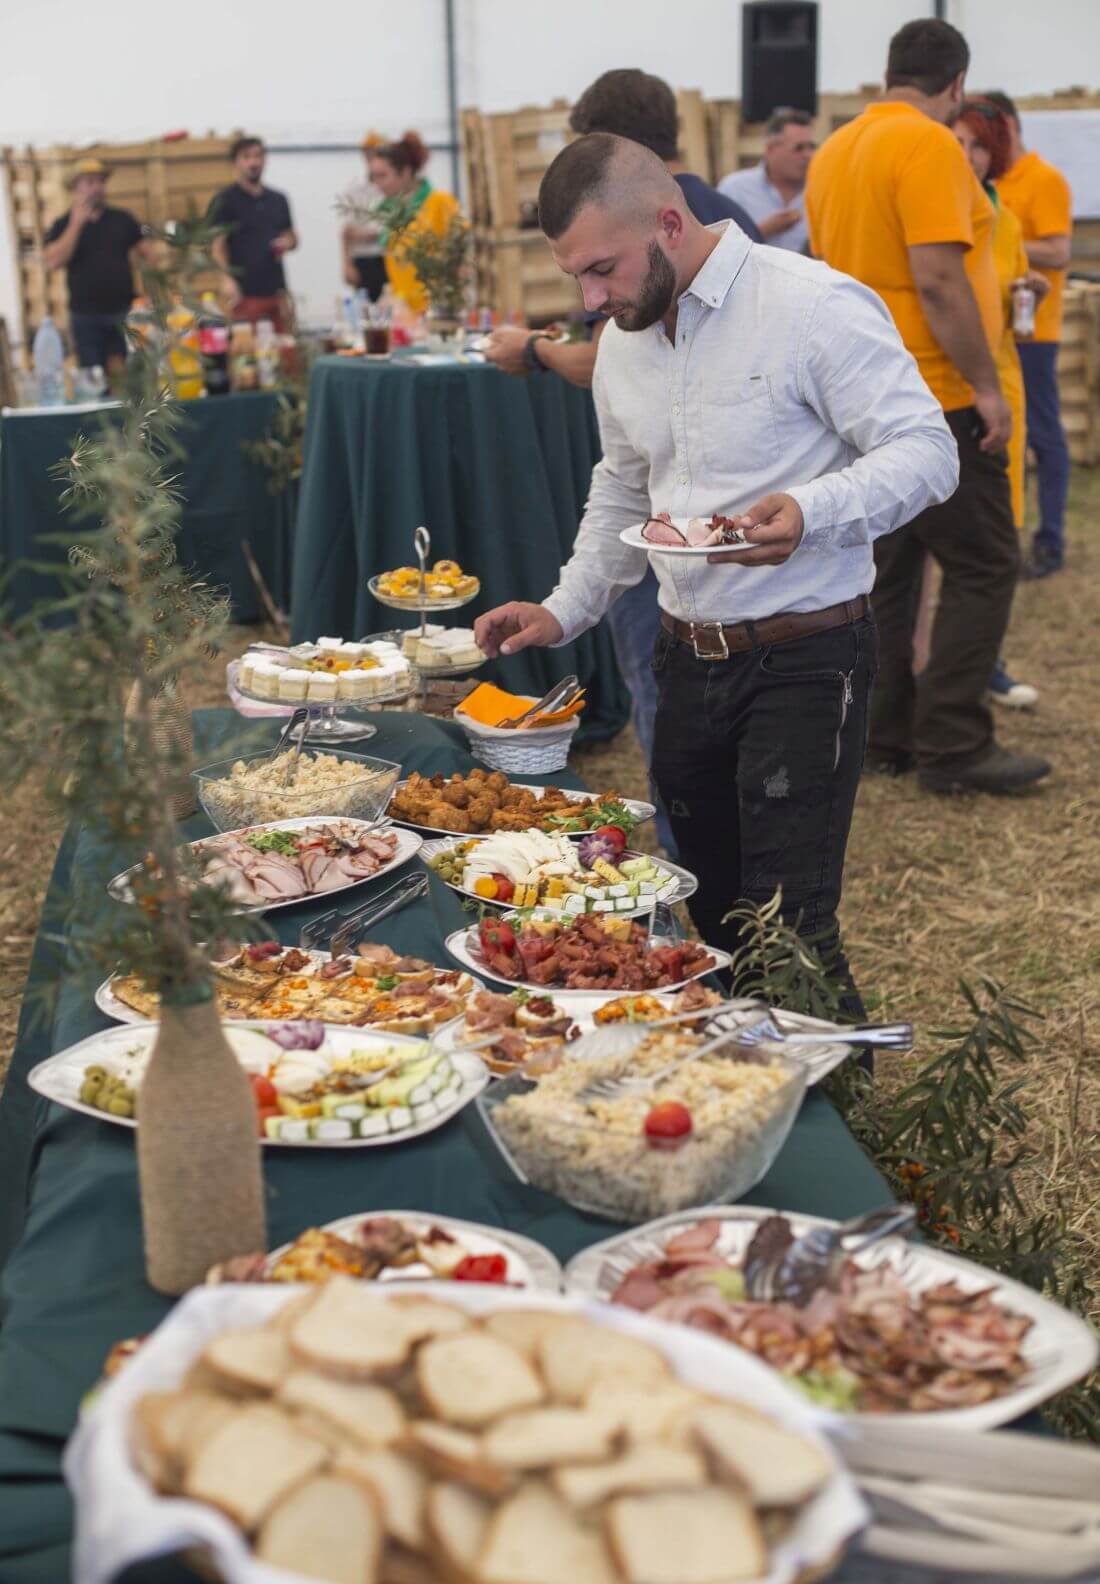 Catering Evenimente - In Bucate Catering - Festivalul Catinei Gaiesti - 1170px - 1